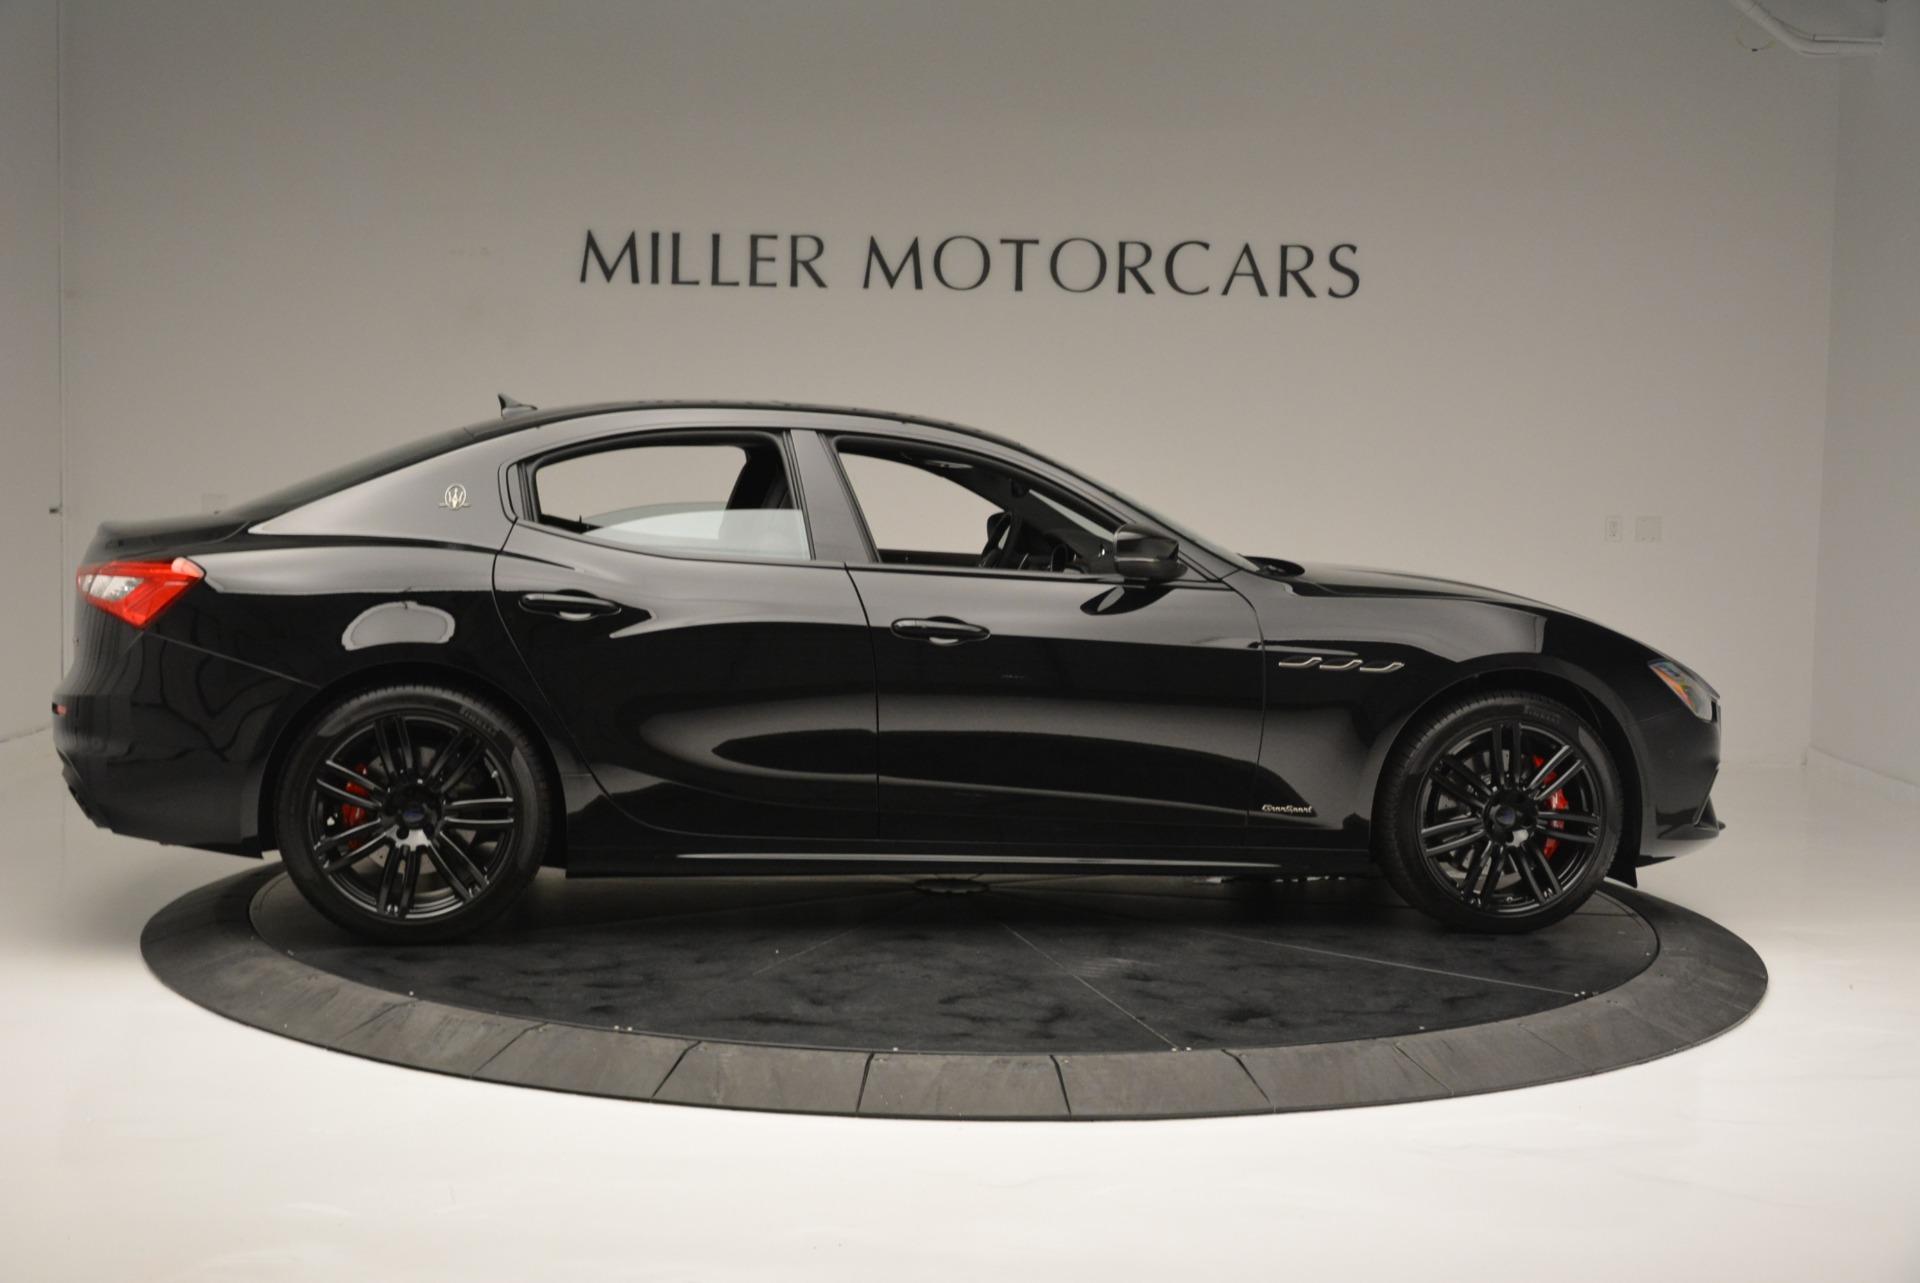 New 2018 Maserati Ghibli SQ4 GranSport Nerissimo For Sale In Westport, CT 2372_p9